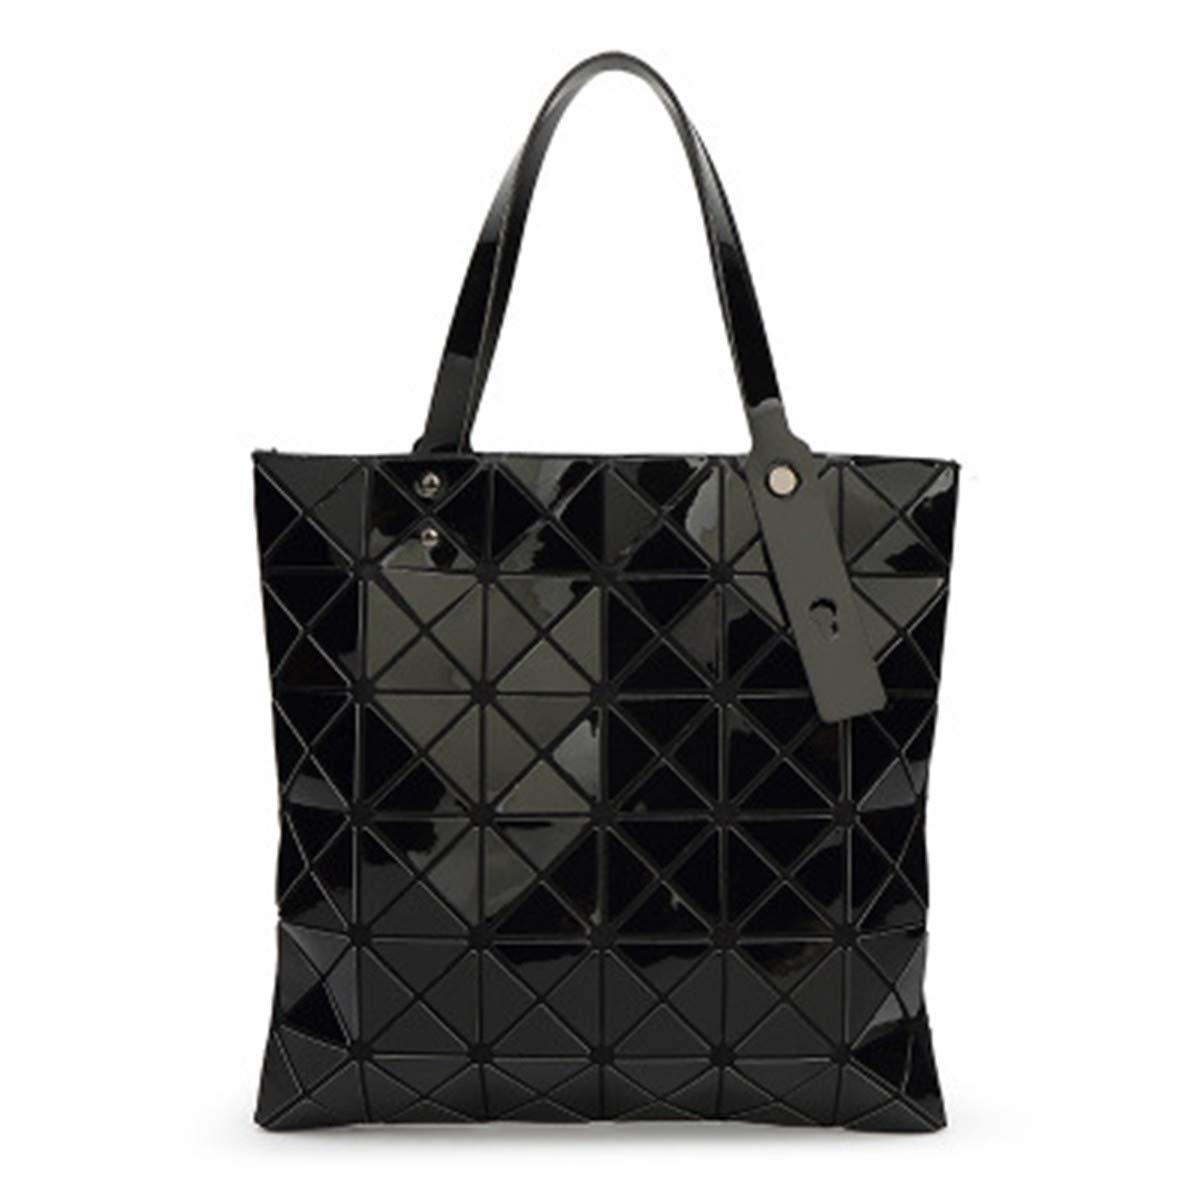 3ebb637603a7 Amazon.com: Women Hologram Tote Purse Geometric Split Joint Plaid Top  Handle Bag PU Leather Handbag Black: Shoes